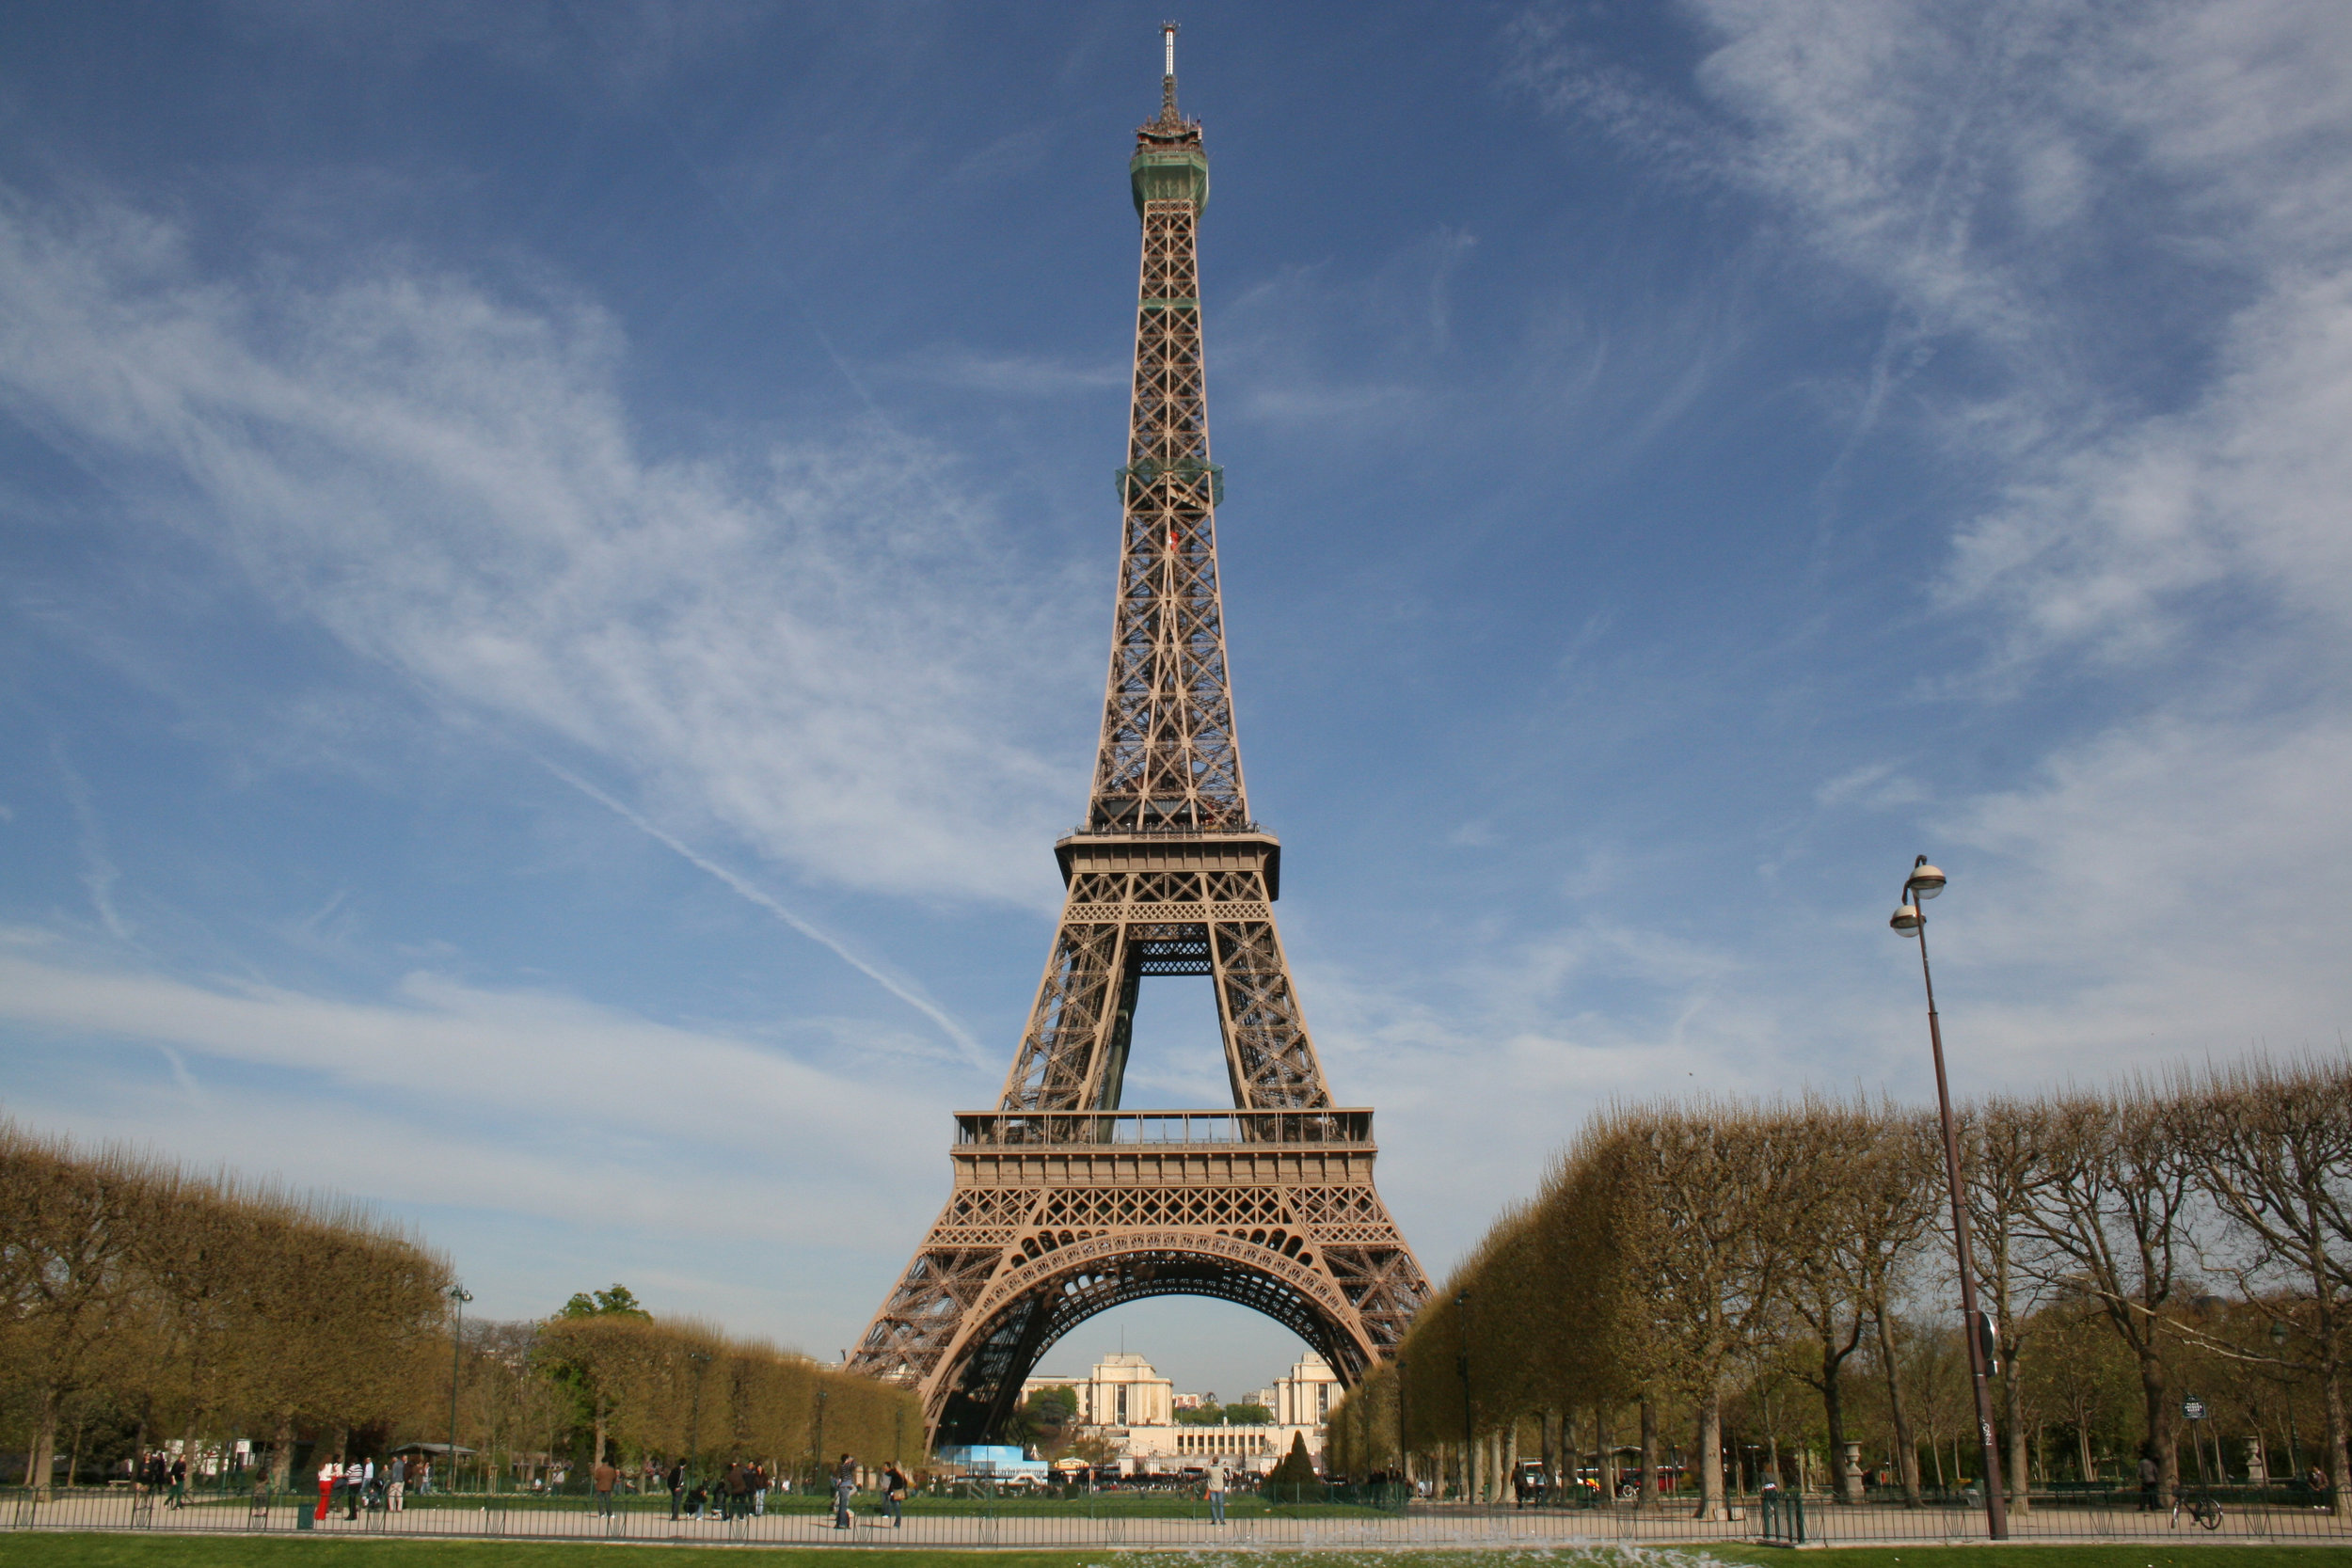 Eiffel_tower-Paris_wikicommons.jpg